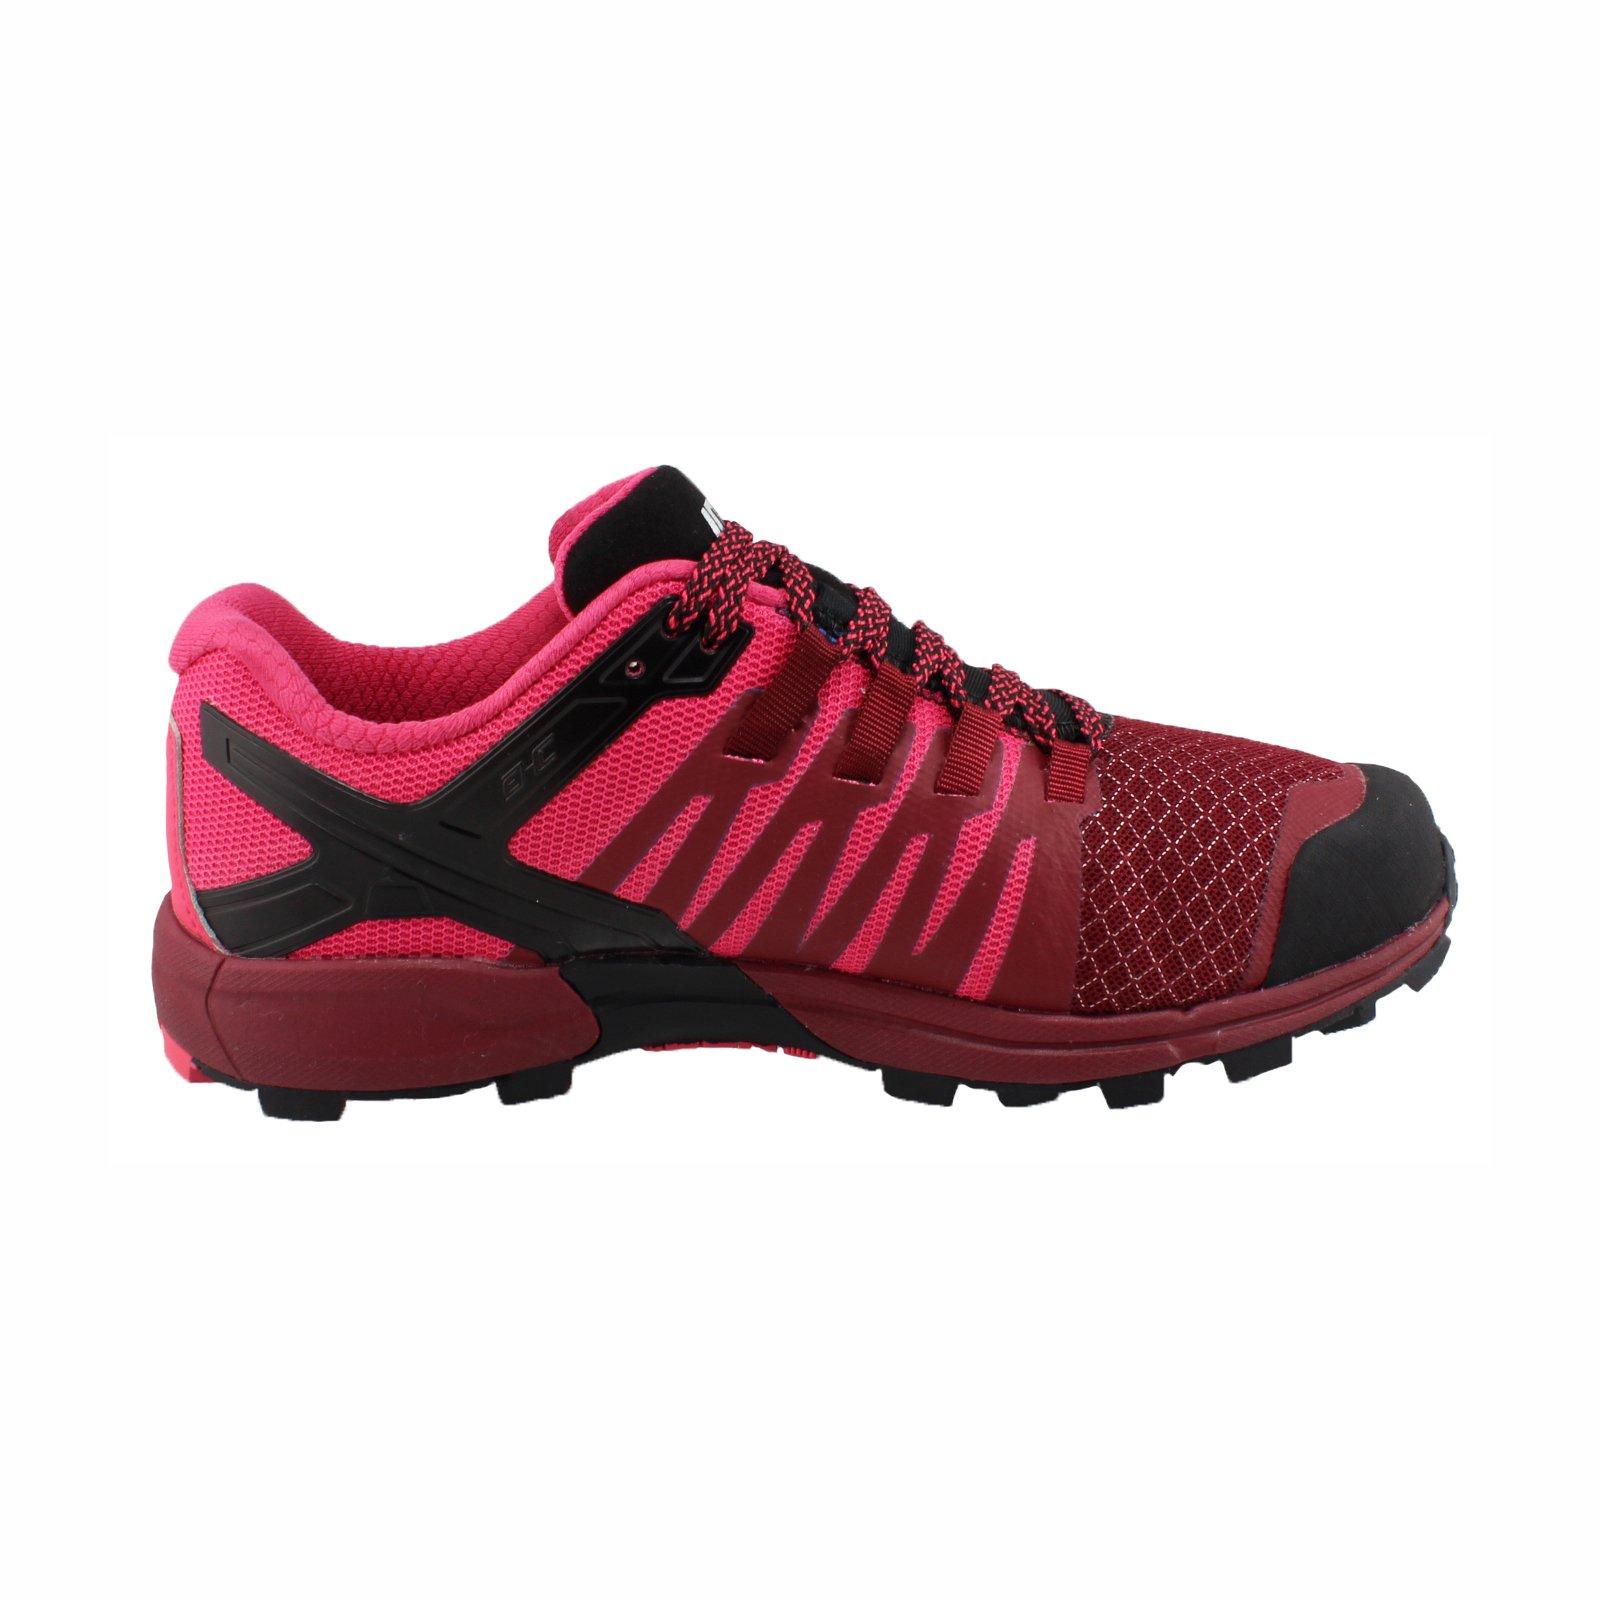 Trailové běžecké boty Inov-8 Roclite 305 (M) W 000555-DRPKBK-M-01 ... 195296aa08